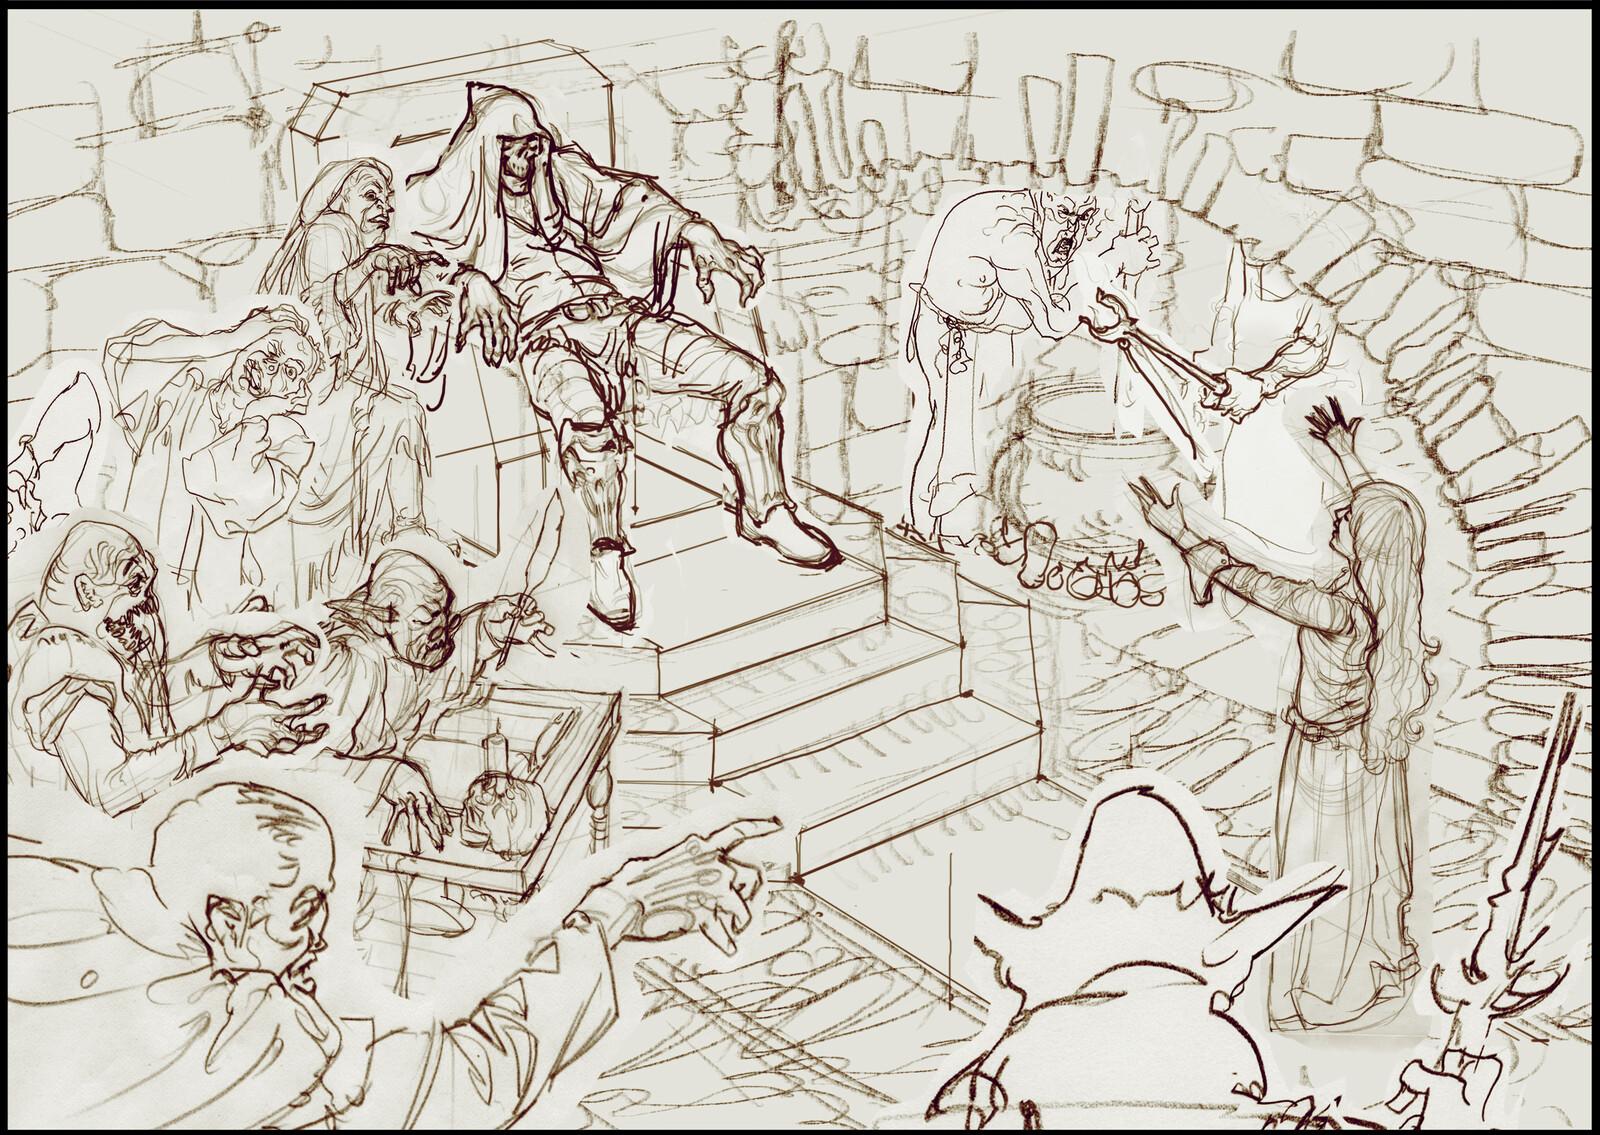 Final Digital Drawing